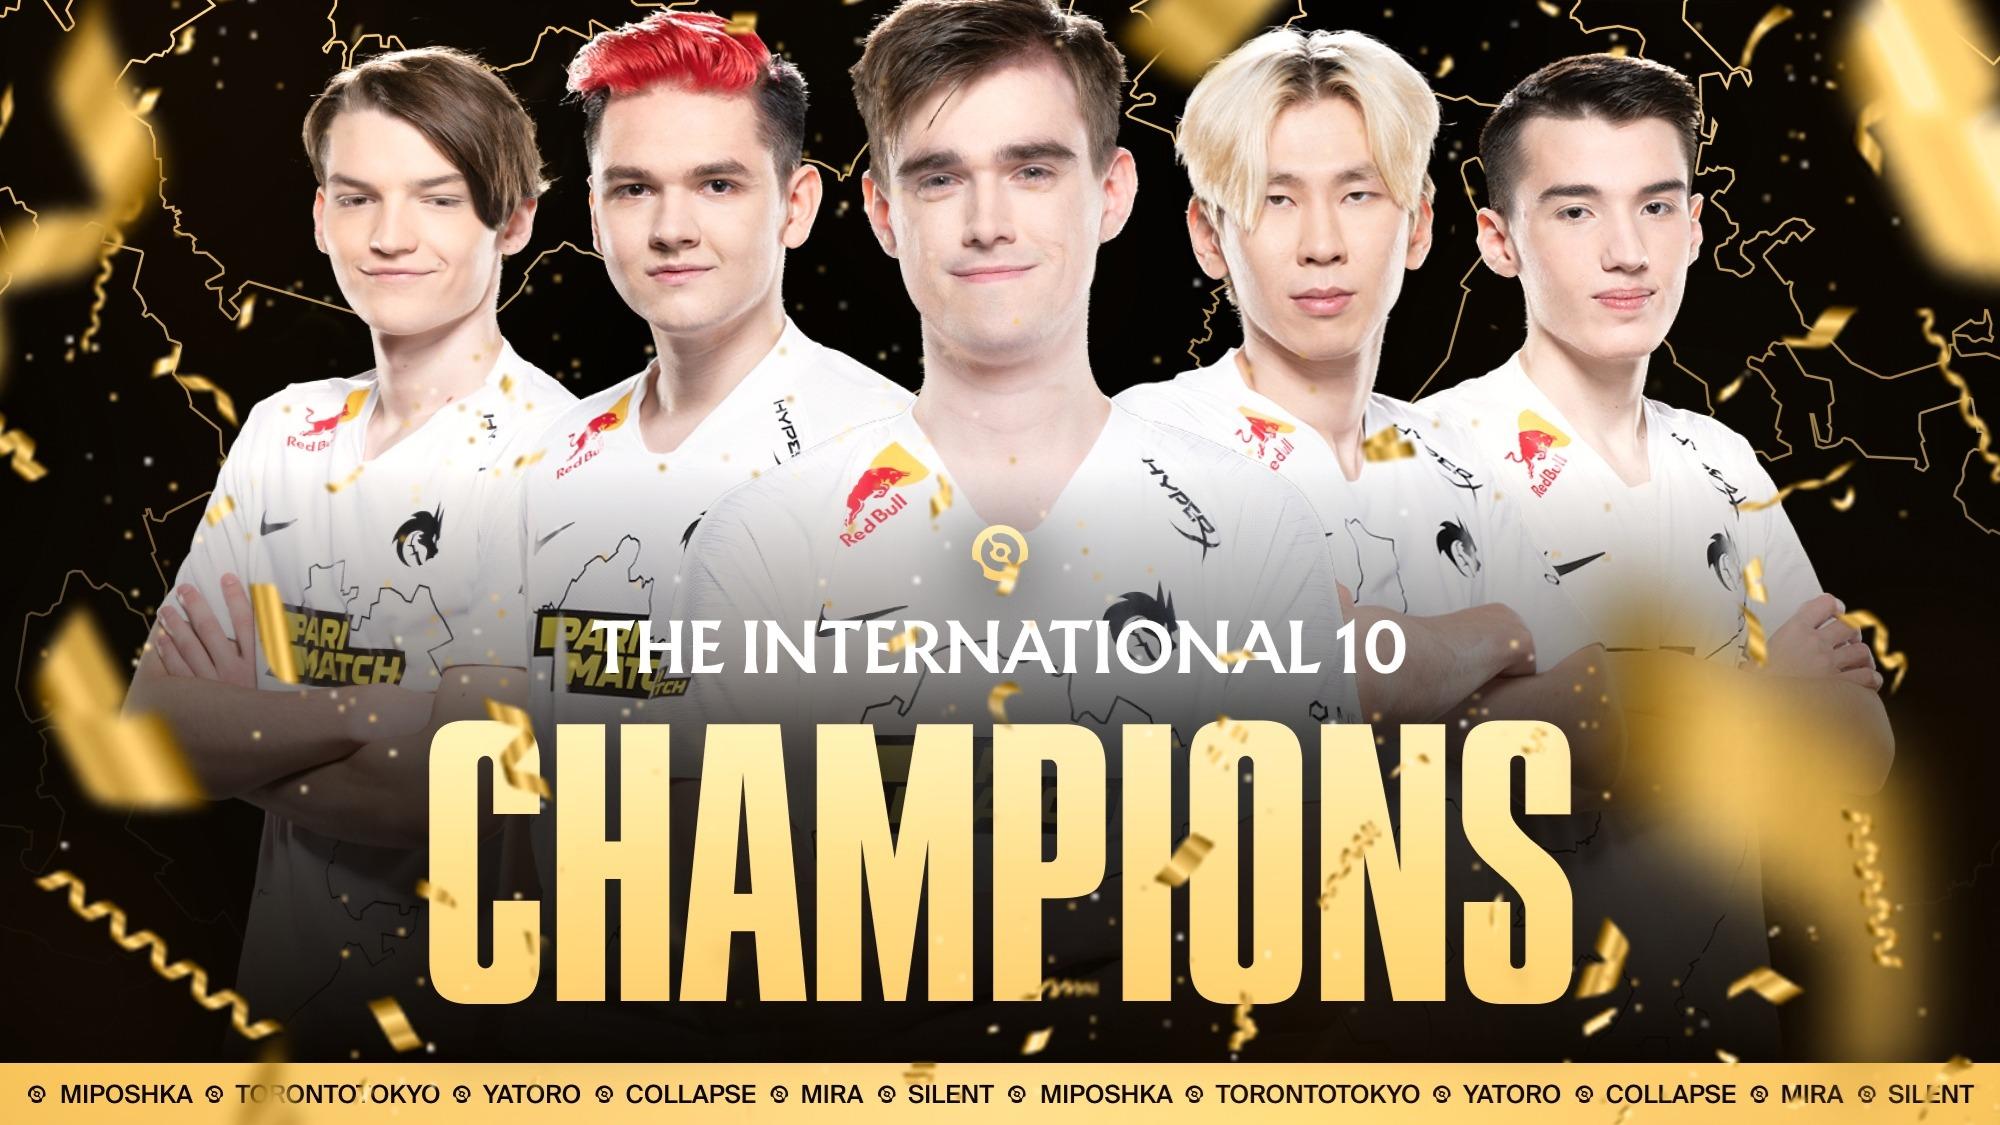 Team Spirit wint The International 10 en ruim 18 miljoen dollar